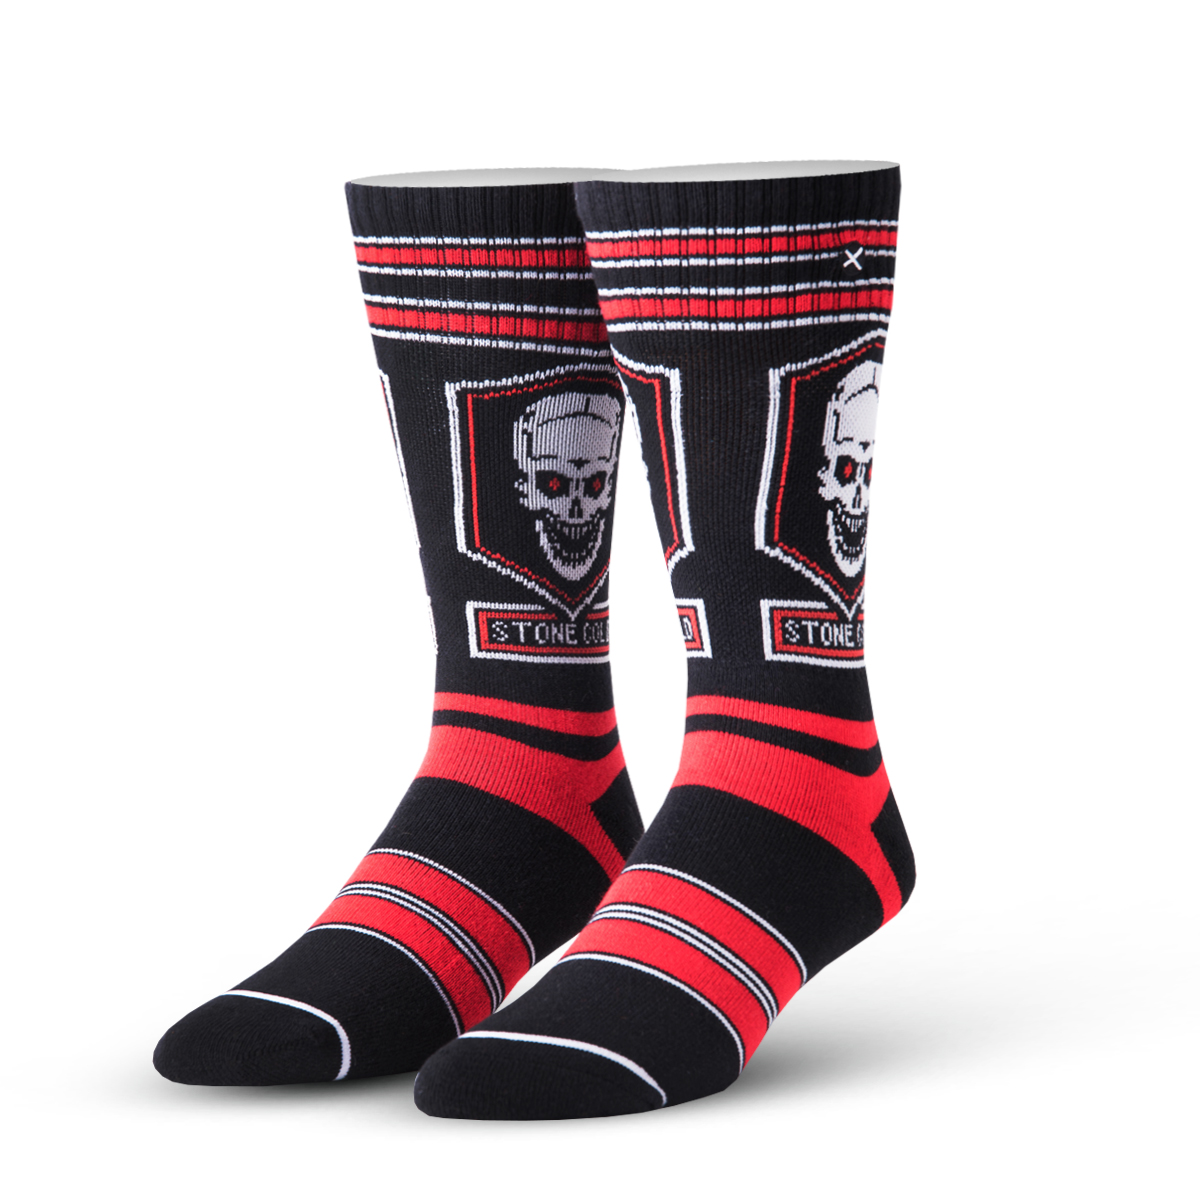 Odd Sox WWE Stone Cold Steve Austin Crew Socks, 6-13